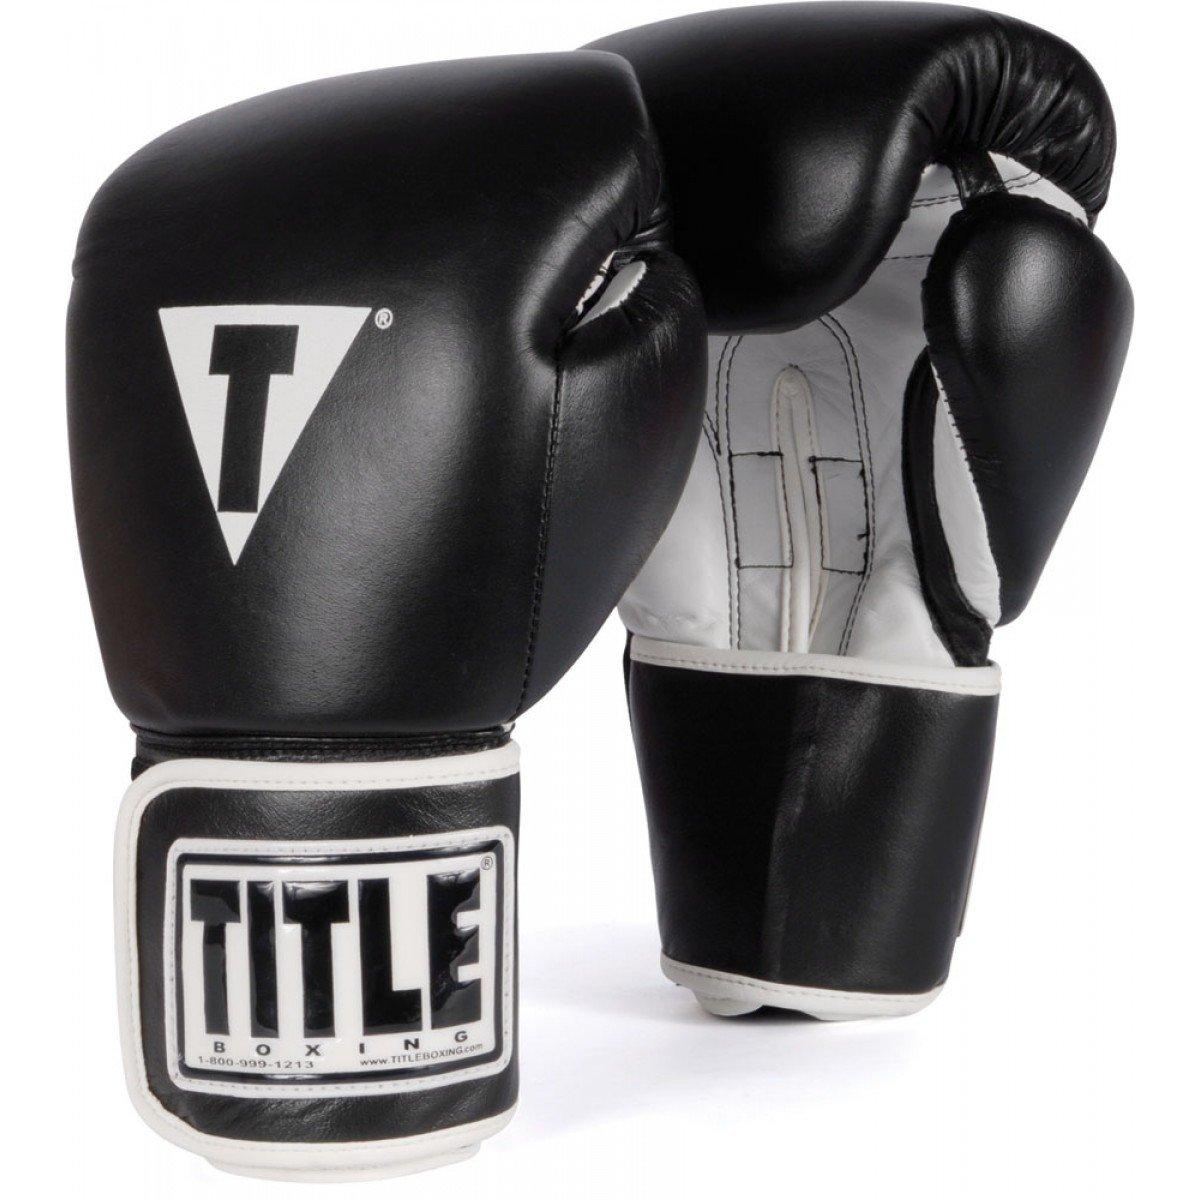 Black leather uniform gloves - Amazon Com Title Boxing Pro Style Leather Training Gloves Sports Outdoors